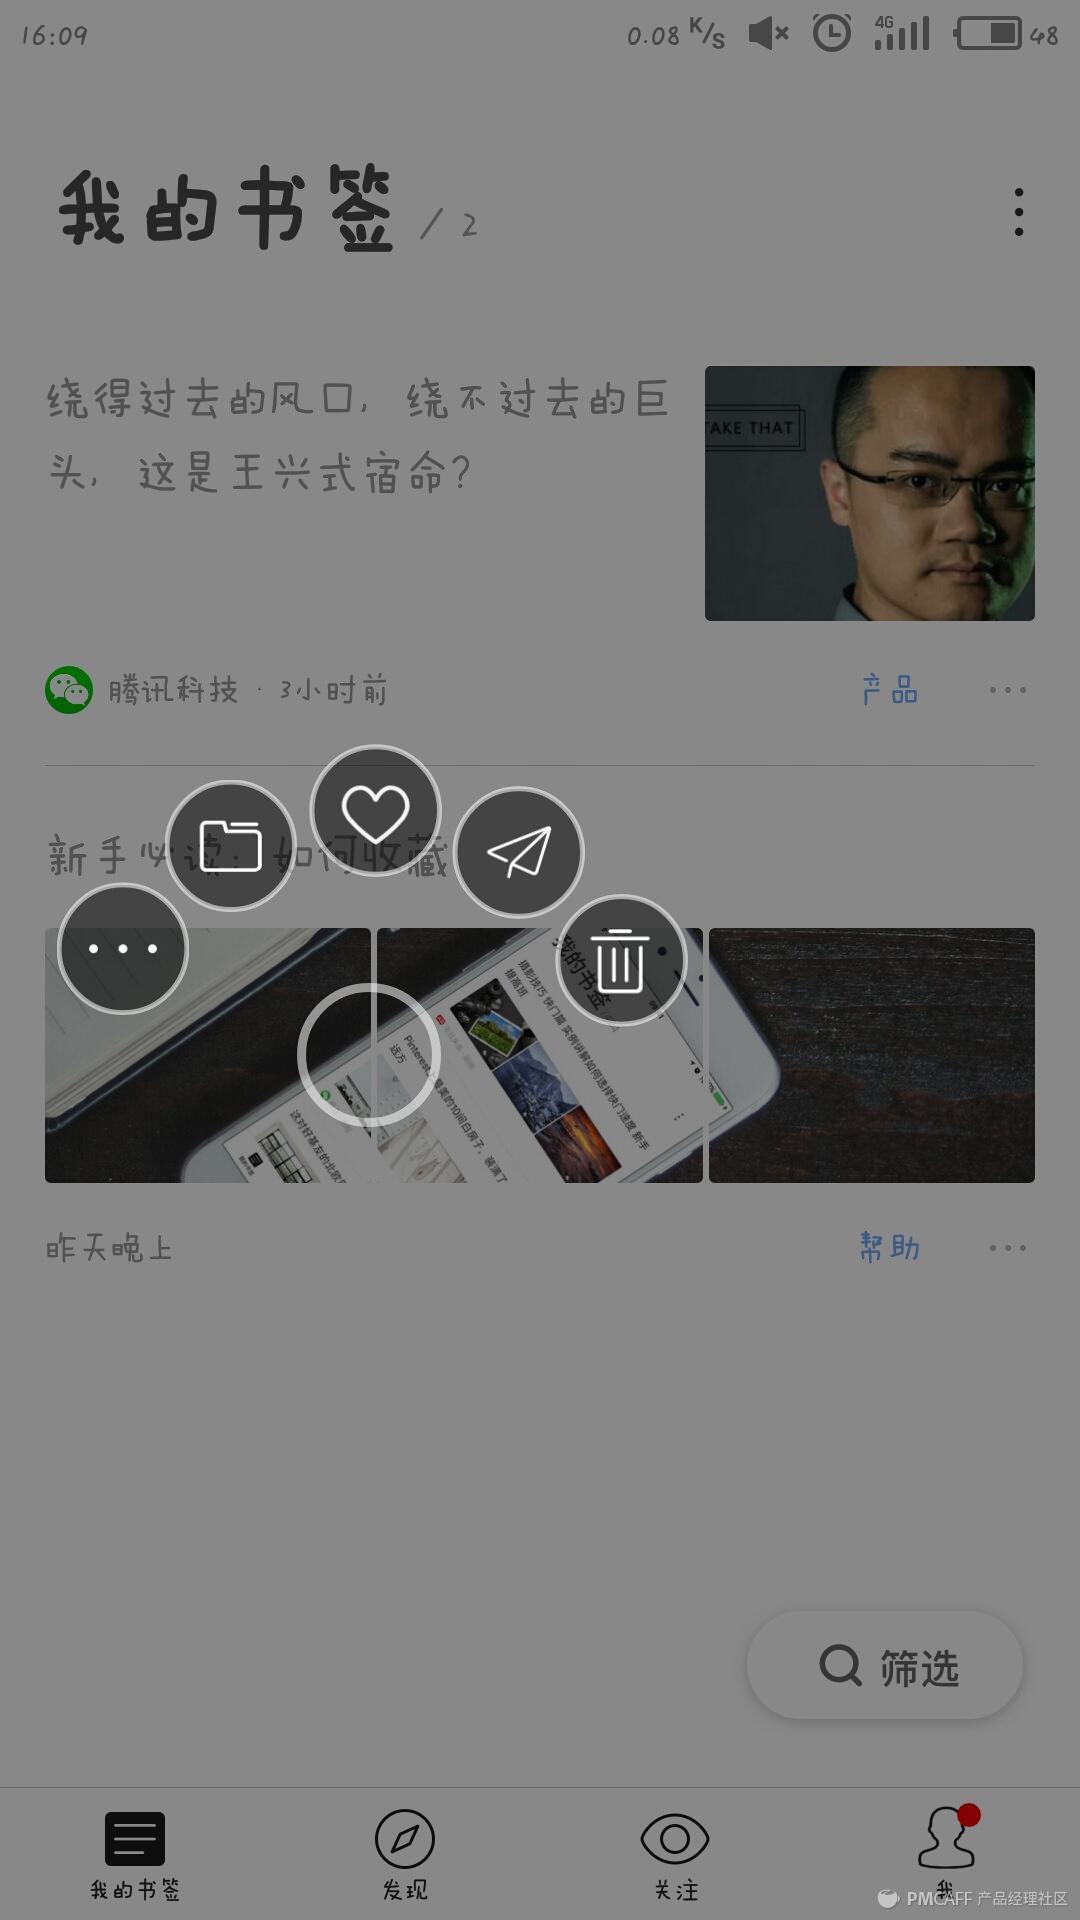 S70607-16093298.jpg